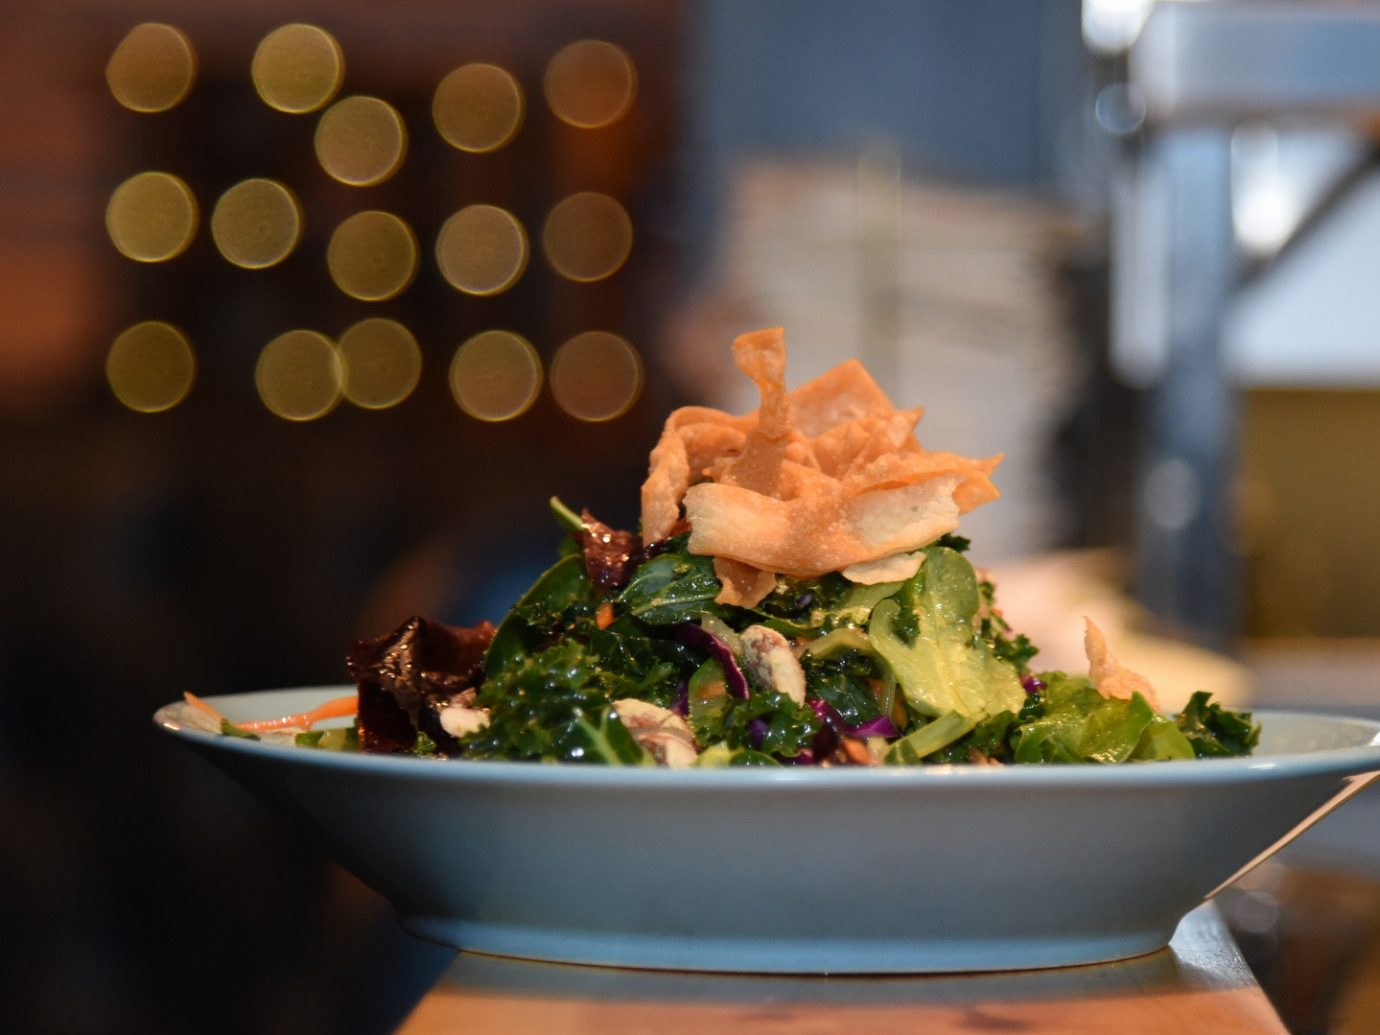 asian Dining Eat food Food + Drink gourmet salad vegetables indoor meal dish restaurant vegetable sense produce dinner